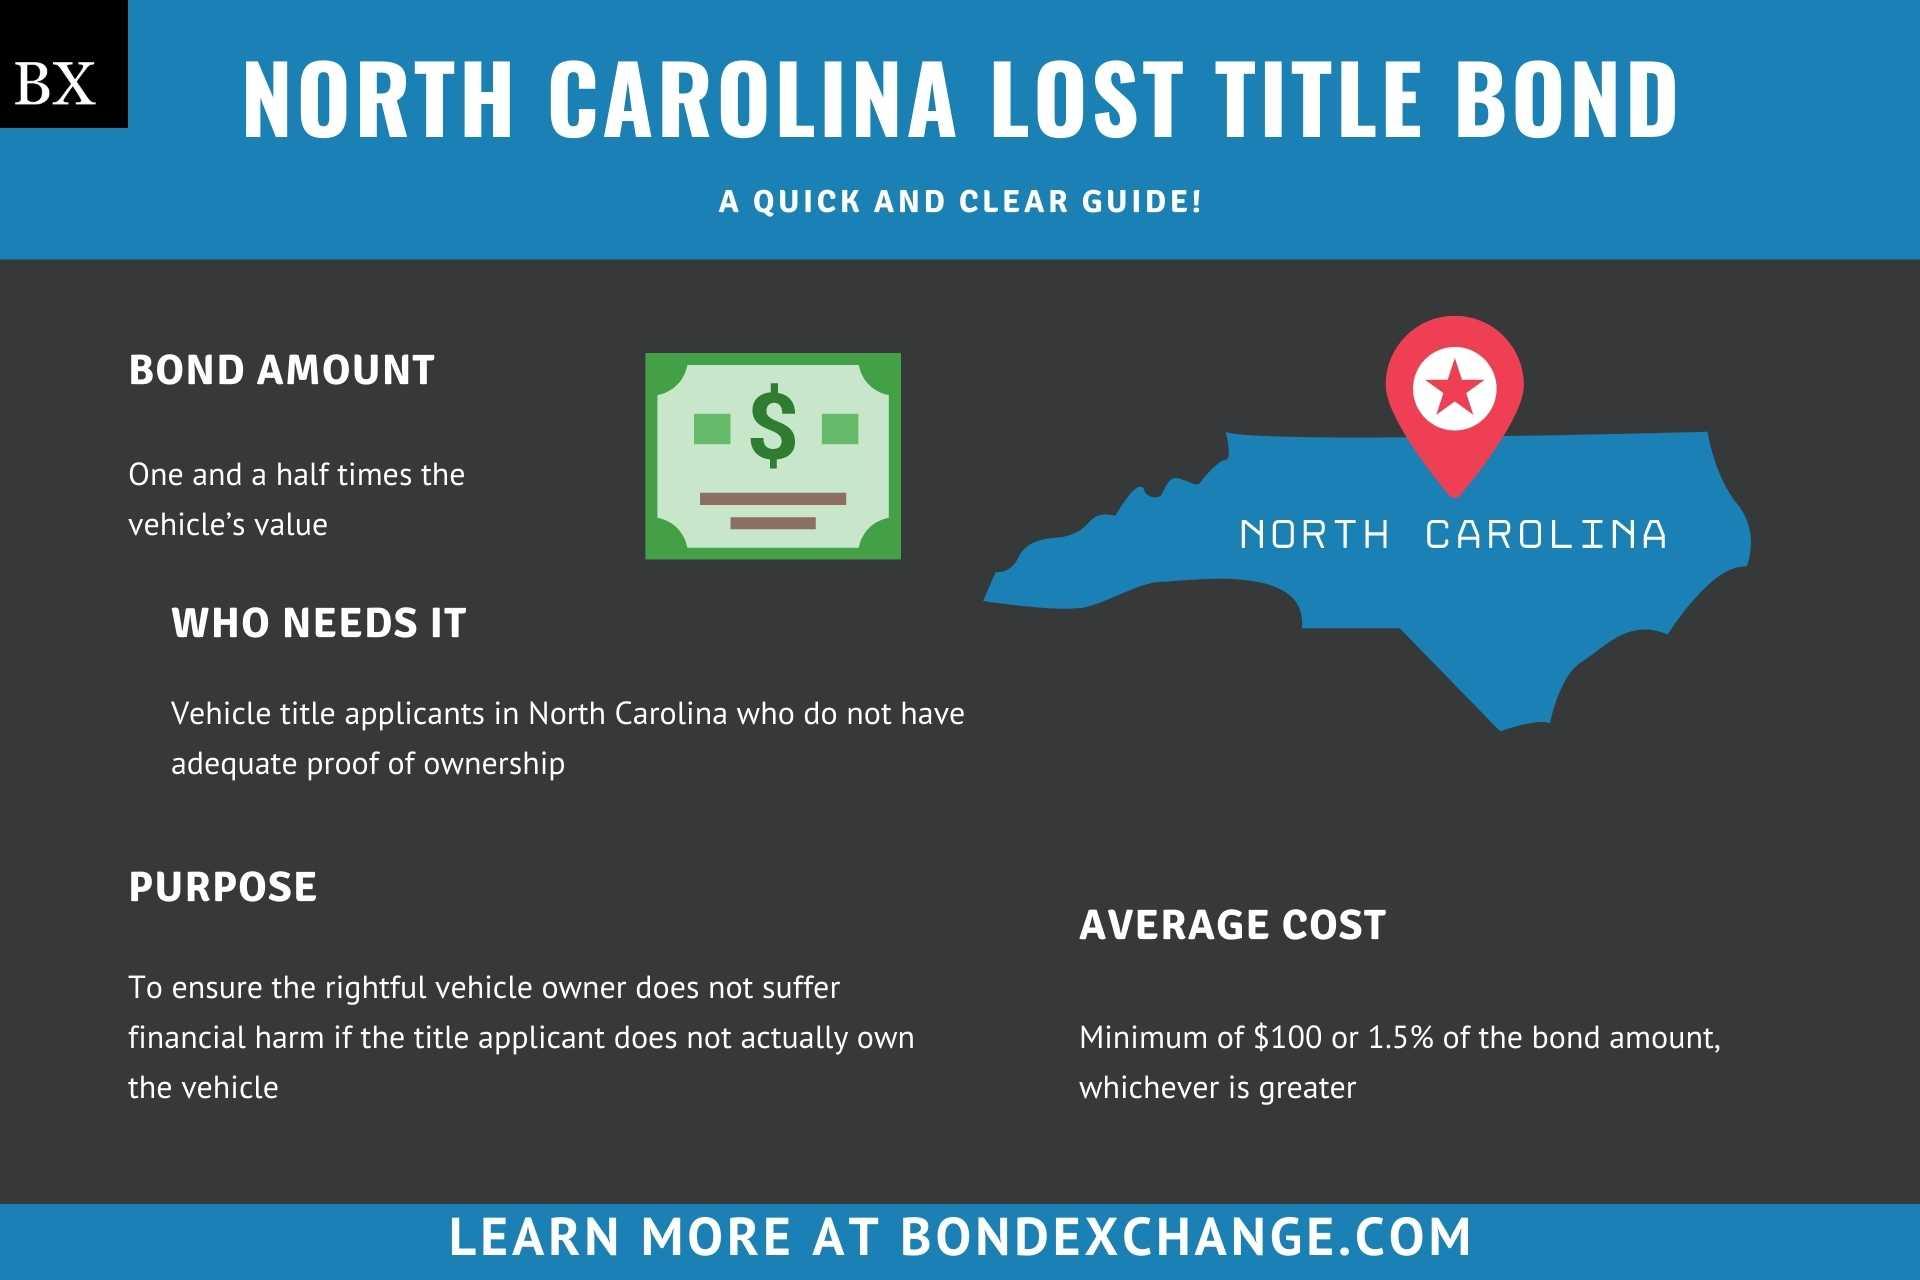 North Carolina Lost Title Bond